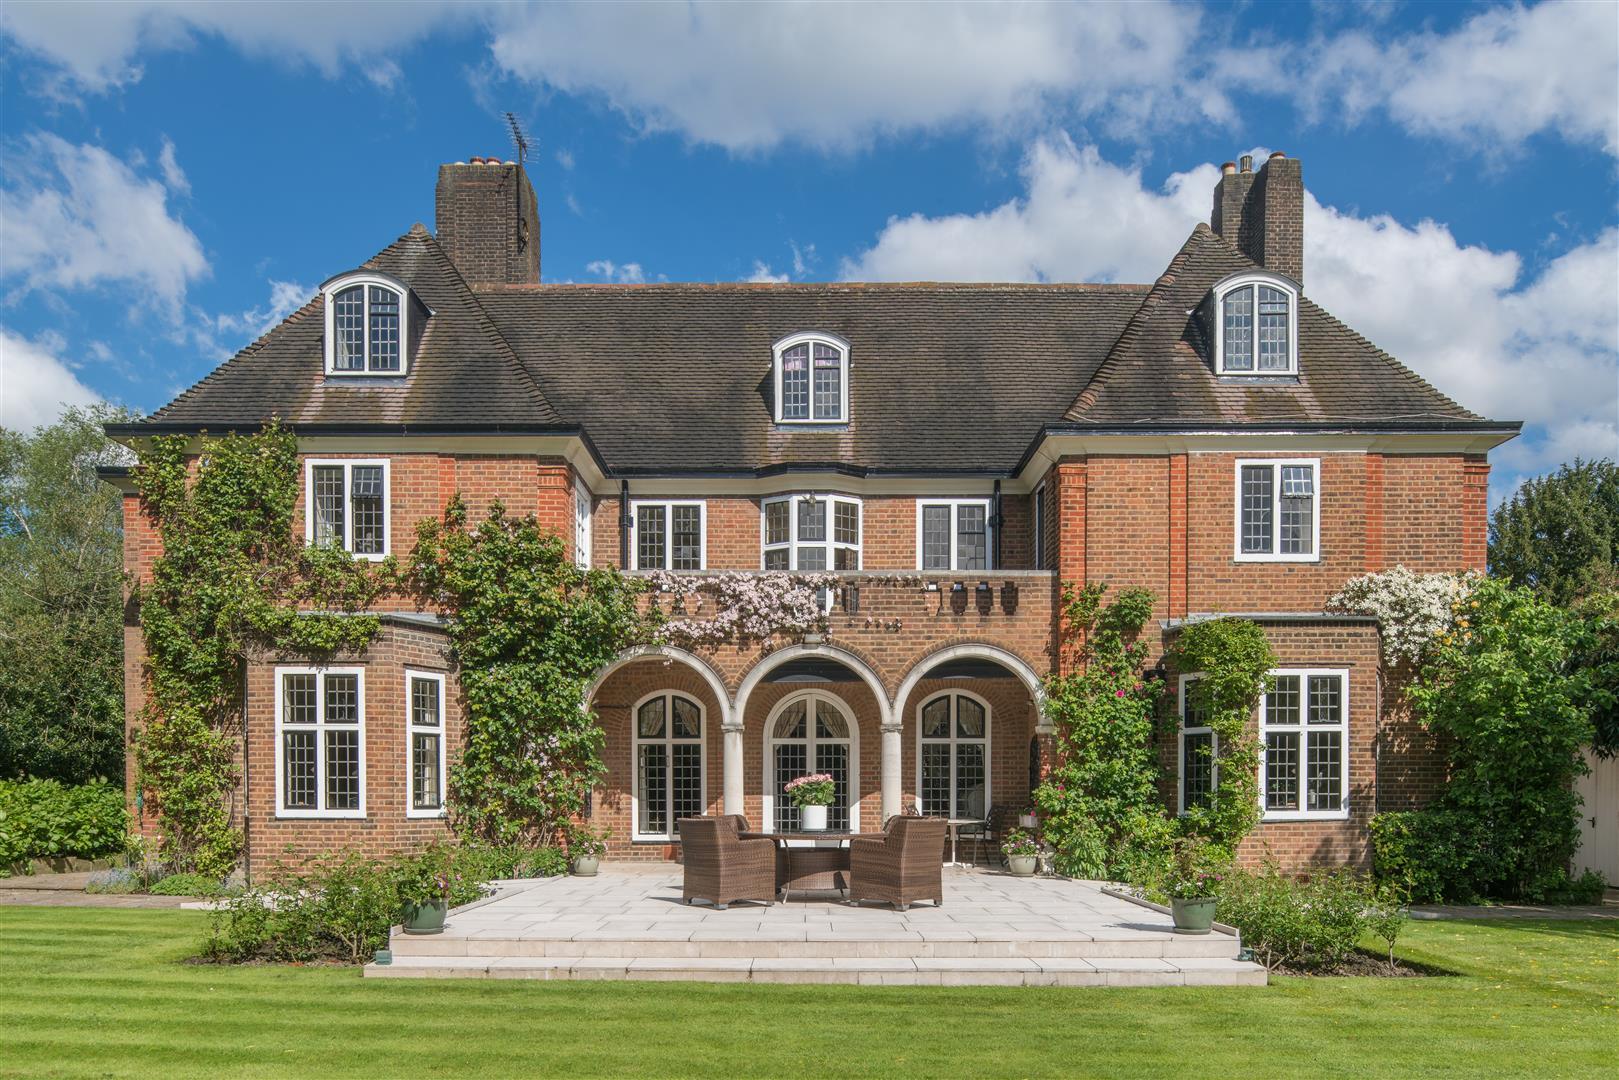 Photos Of Hampstead Garden Suburb London Nw11 43882949